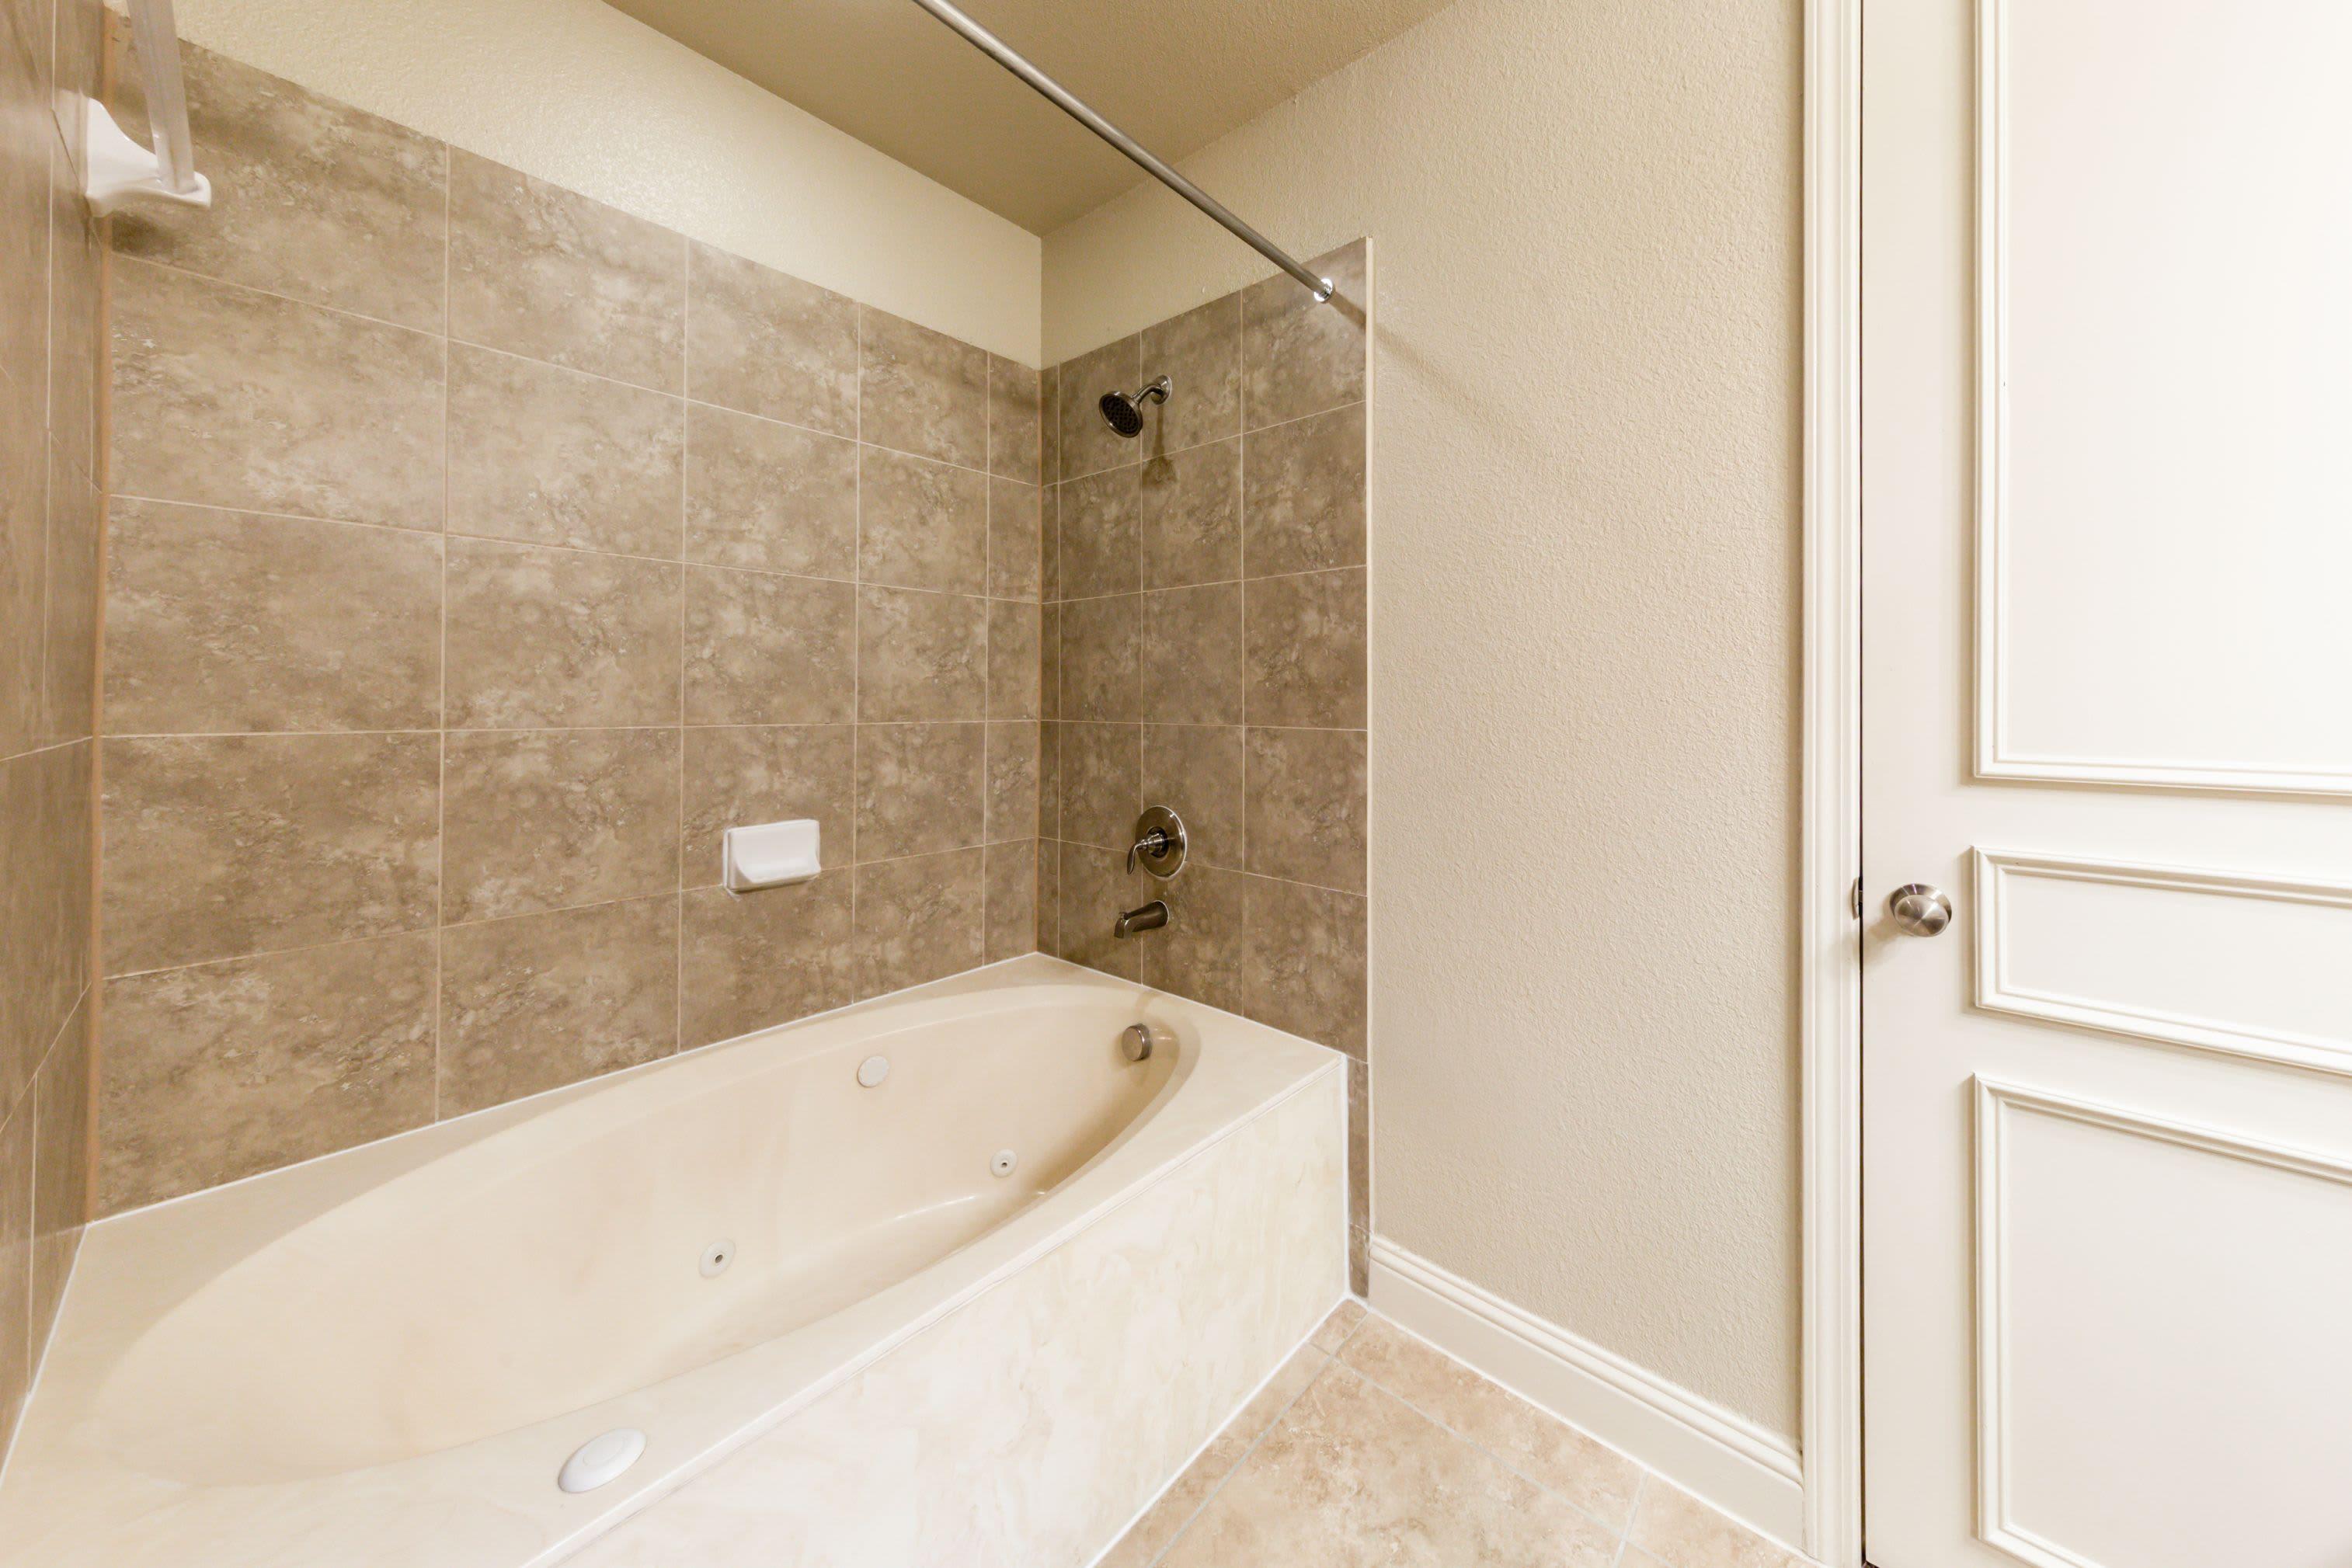 Bathroom with oval bath tub at Marquis at TPC in San Antonio, Texas